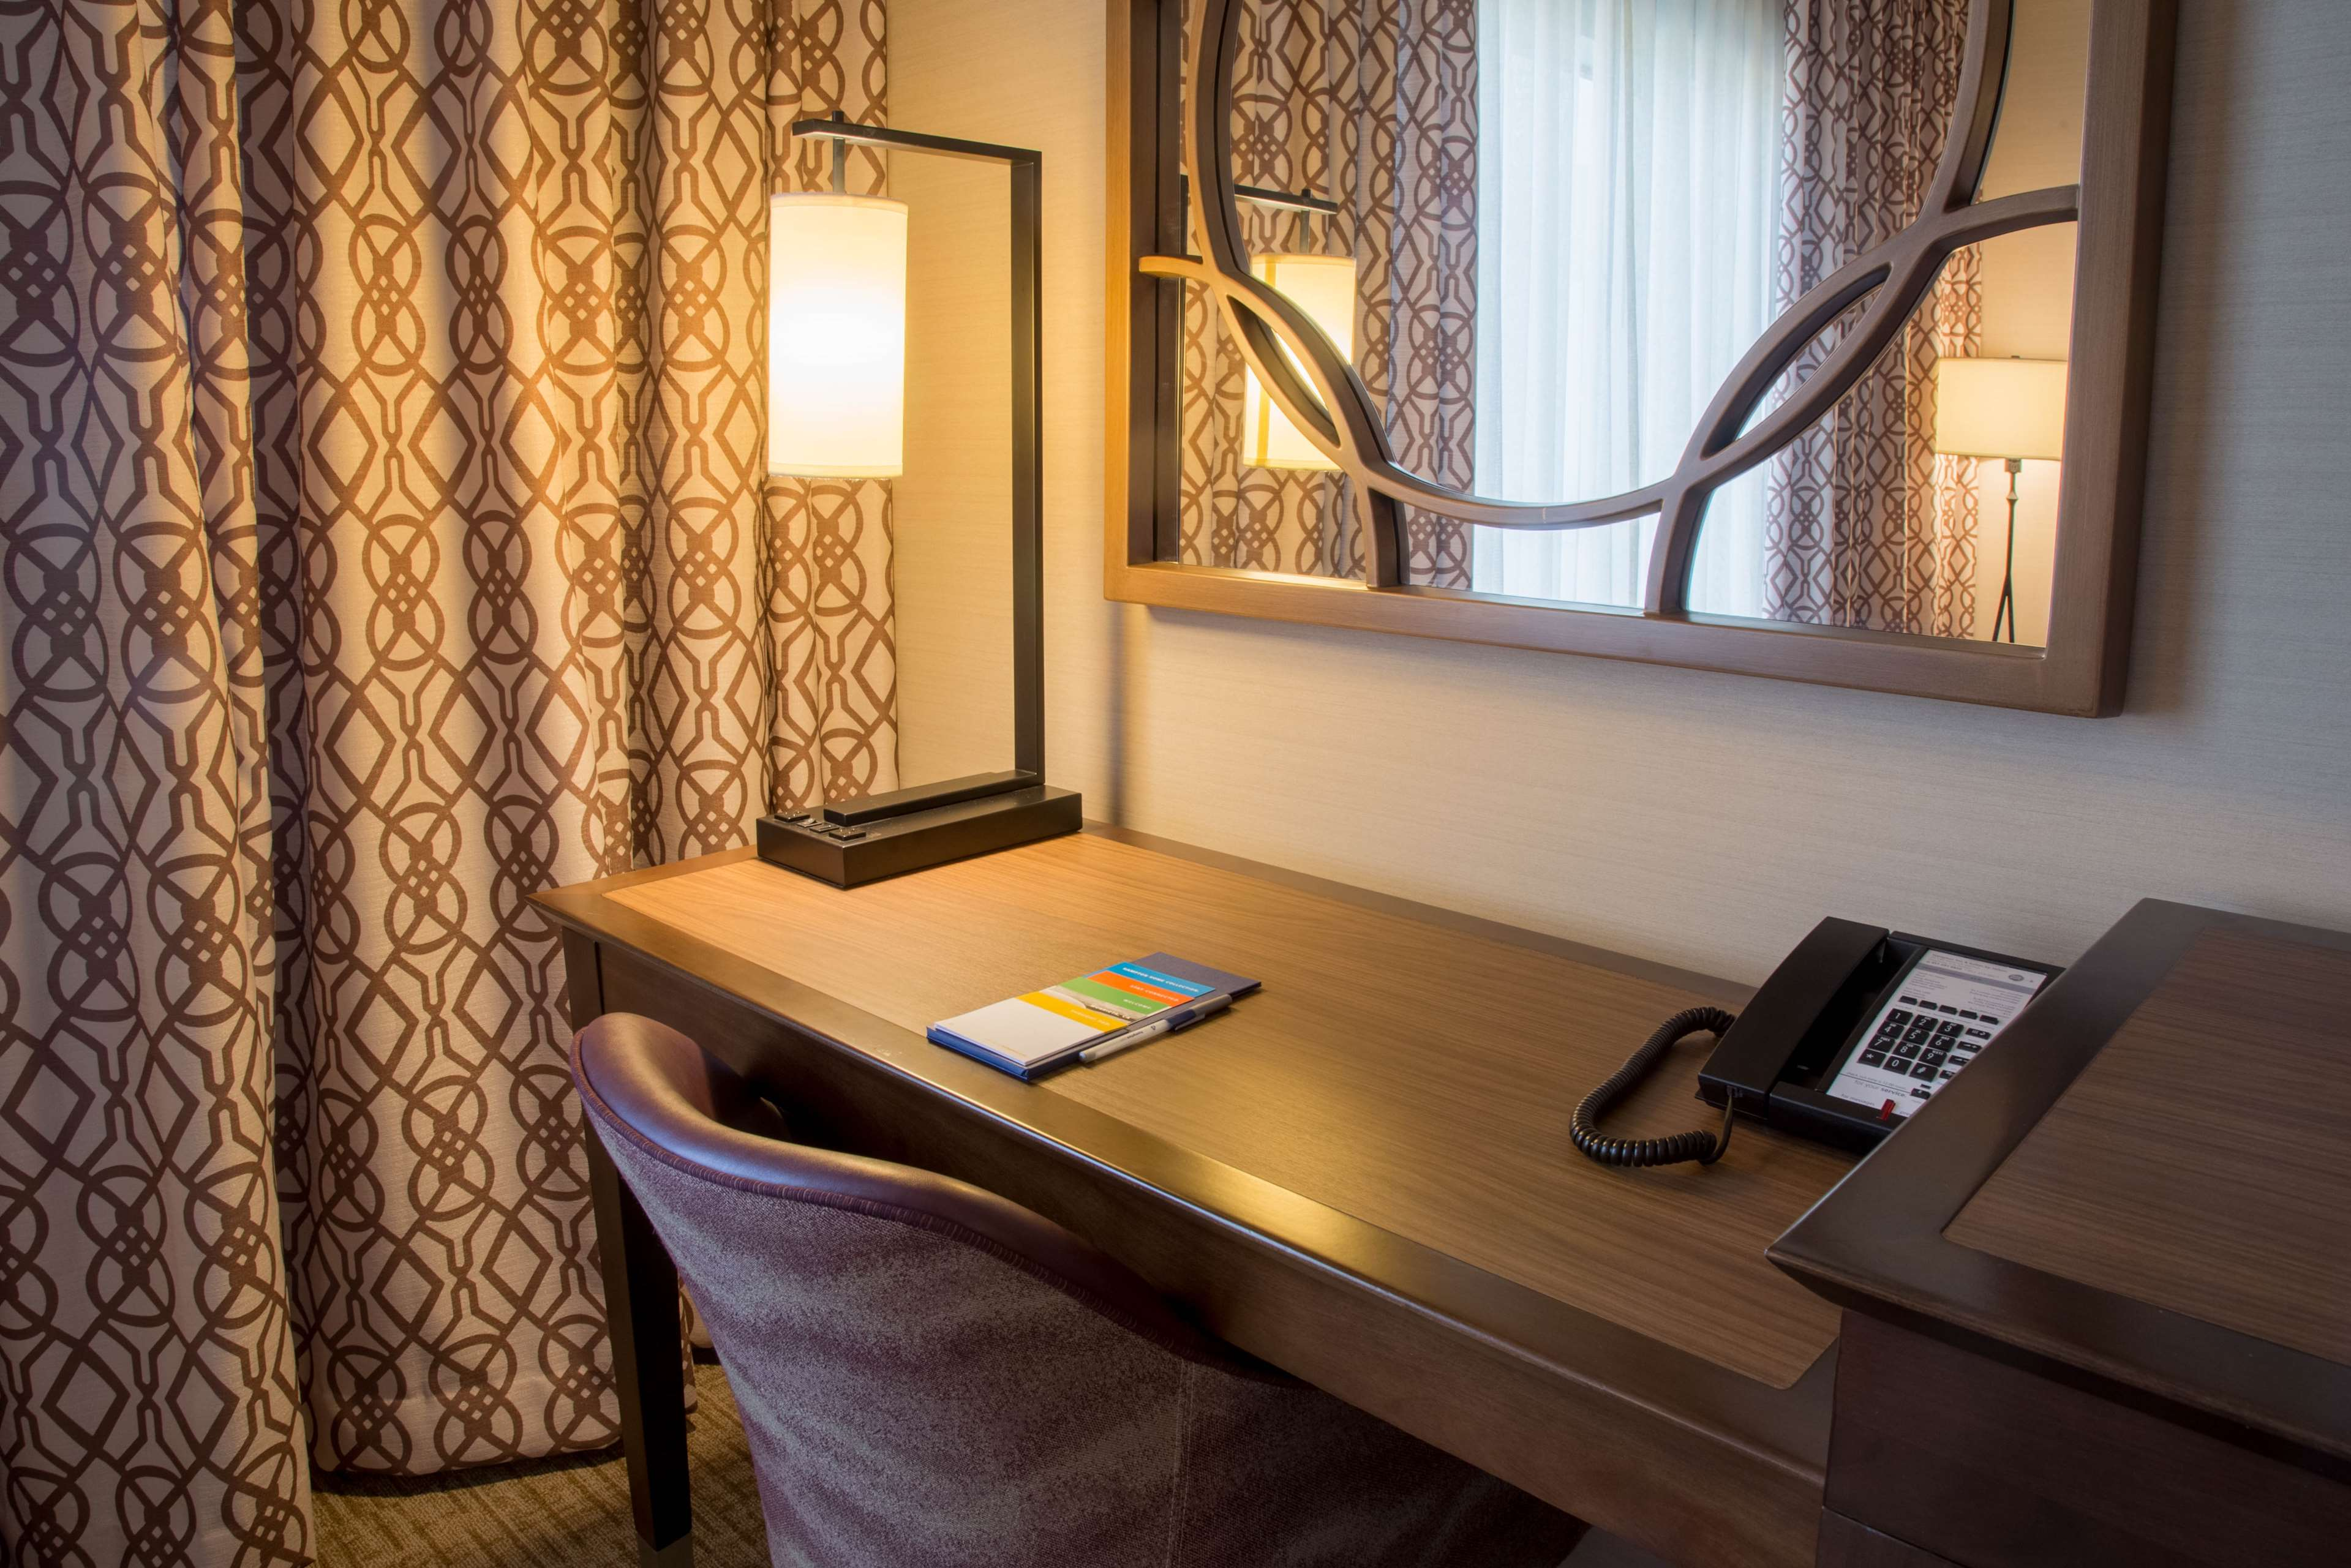 Hampton Inn & Suites Murrieta Temecula image 23